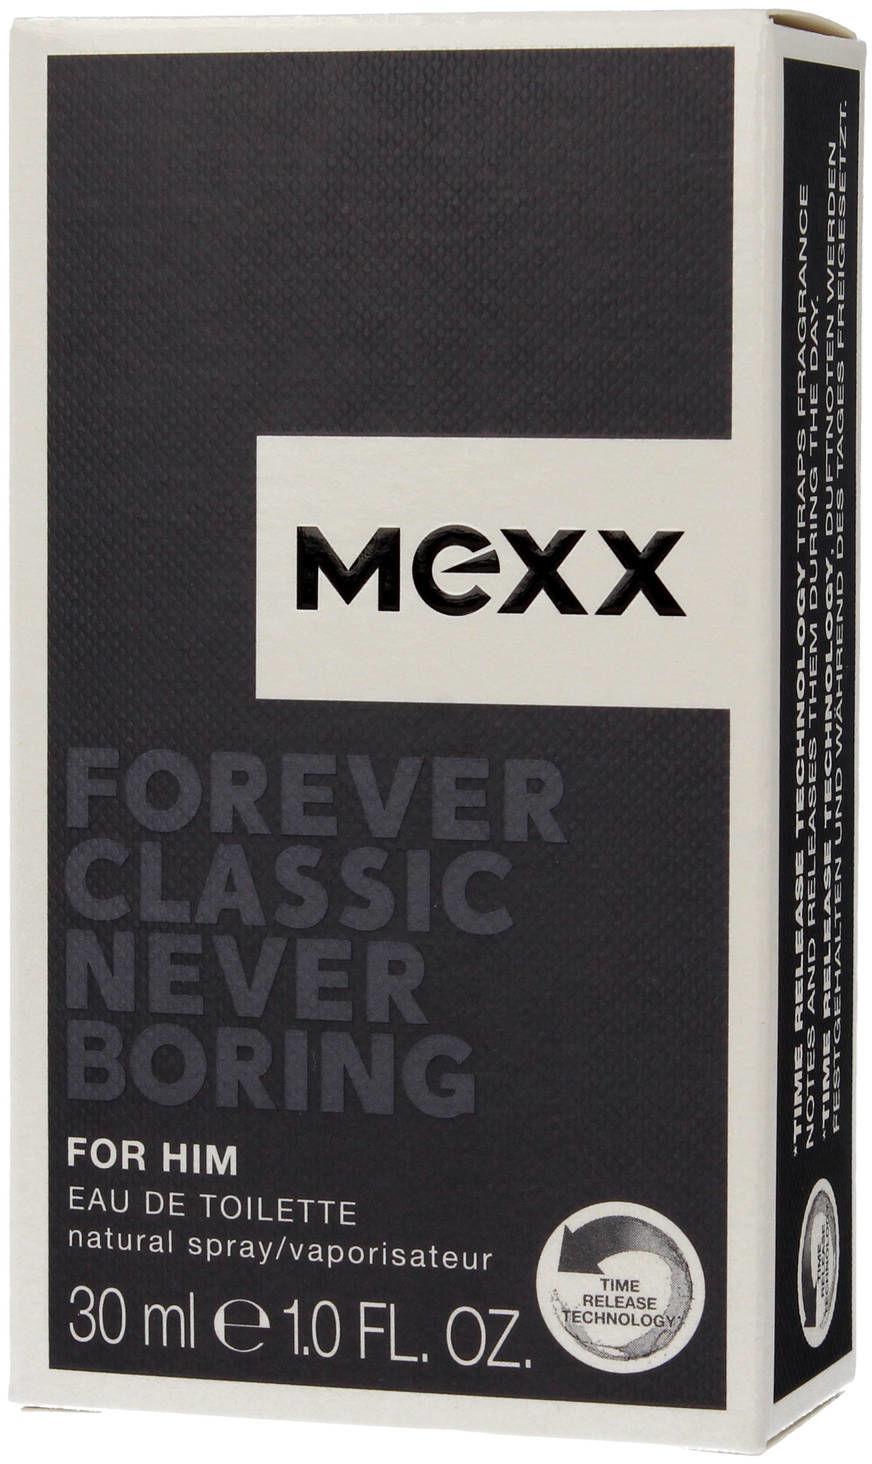 Mexx Forever Classic Never Boring for Him Woda toaletowa 30ml